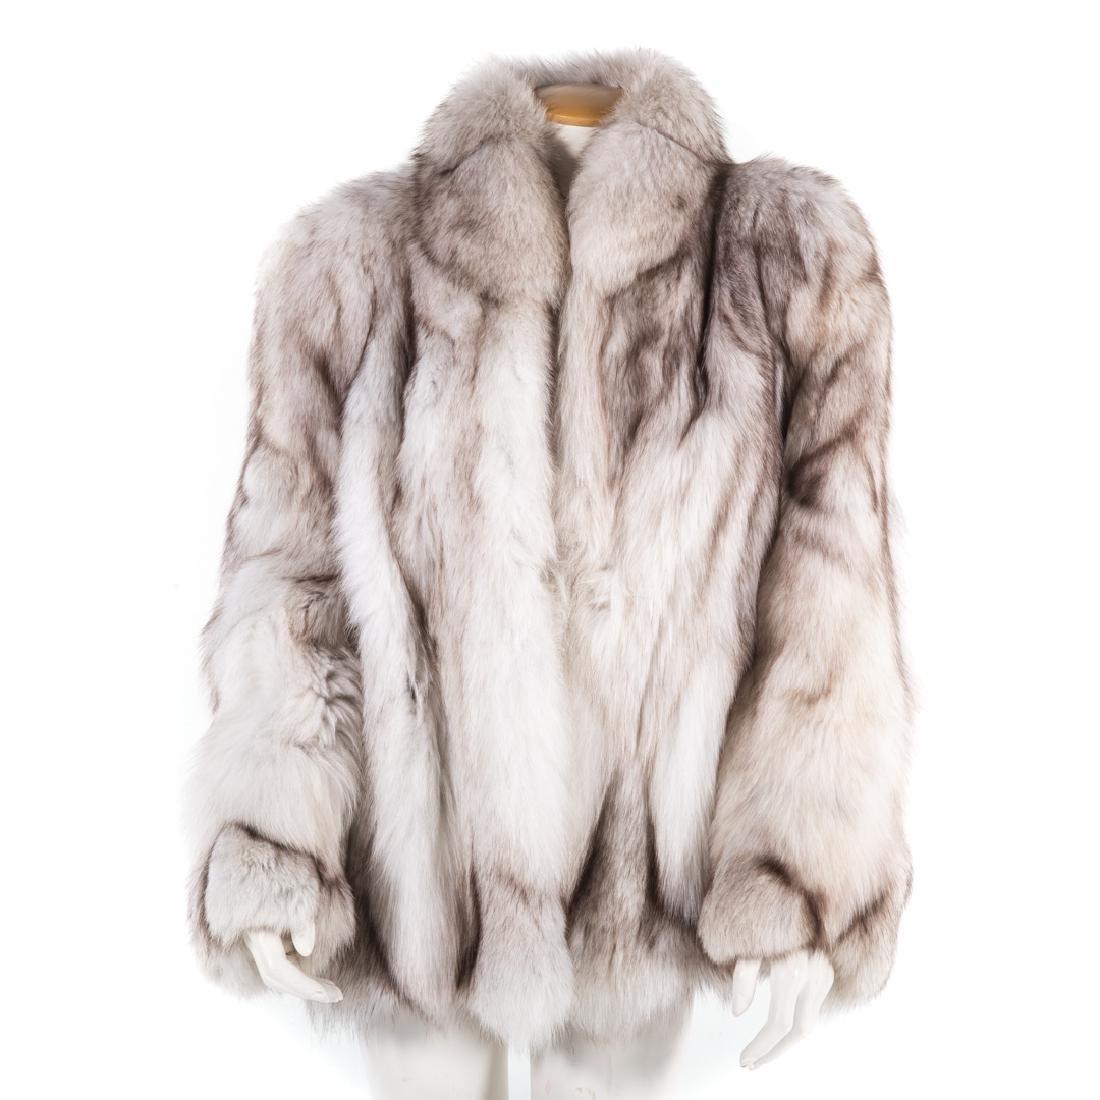 A Lady's Blue Fox Jacket